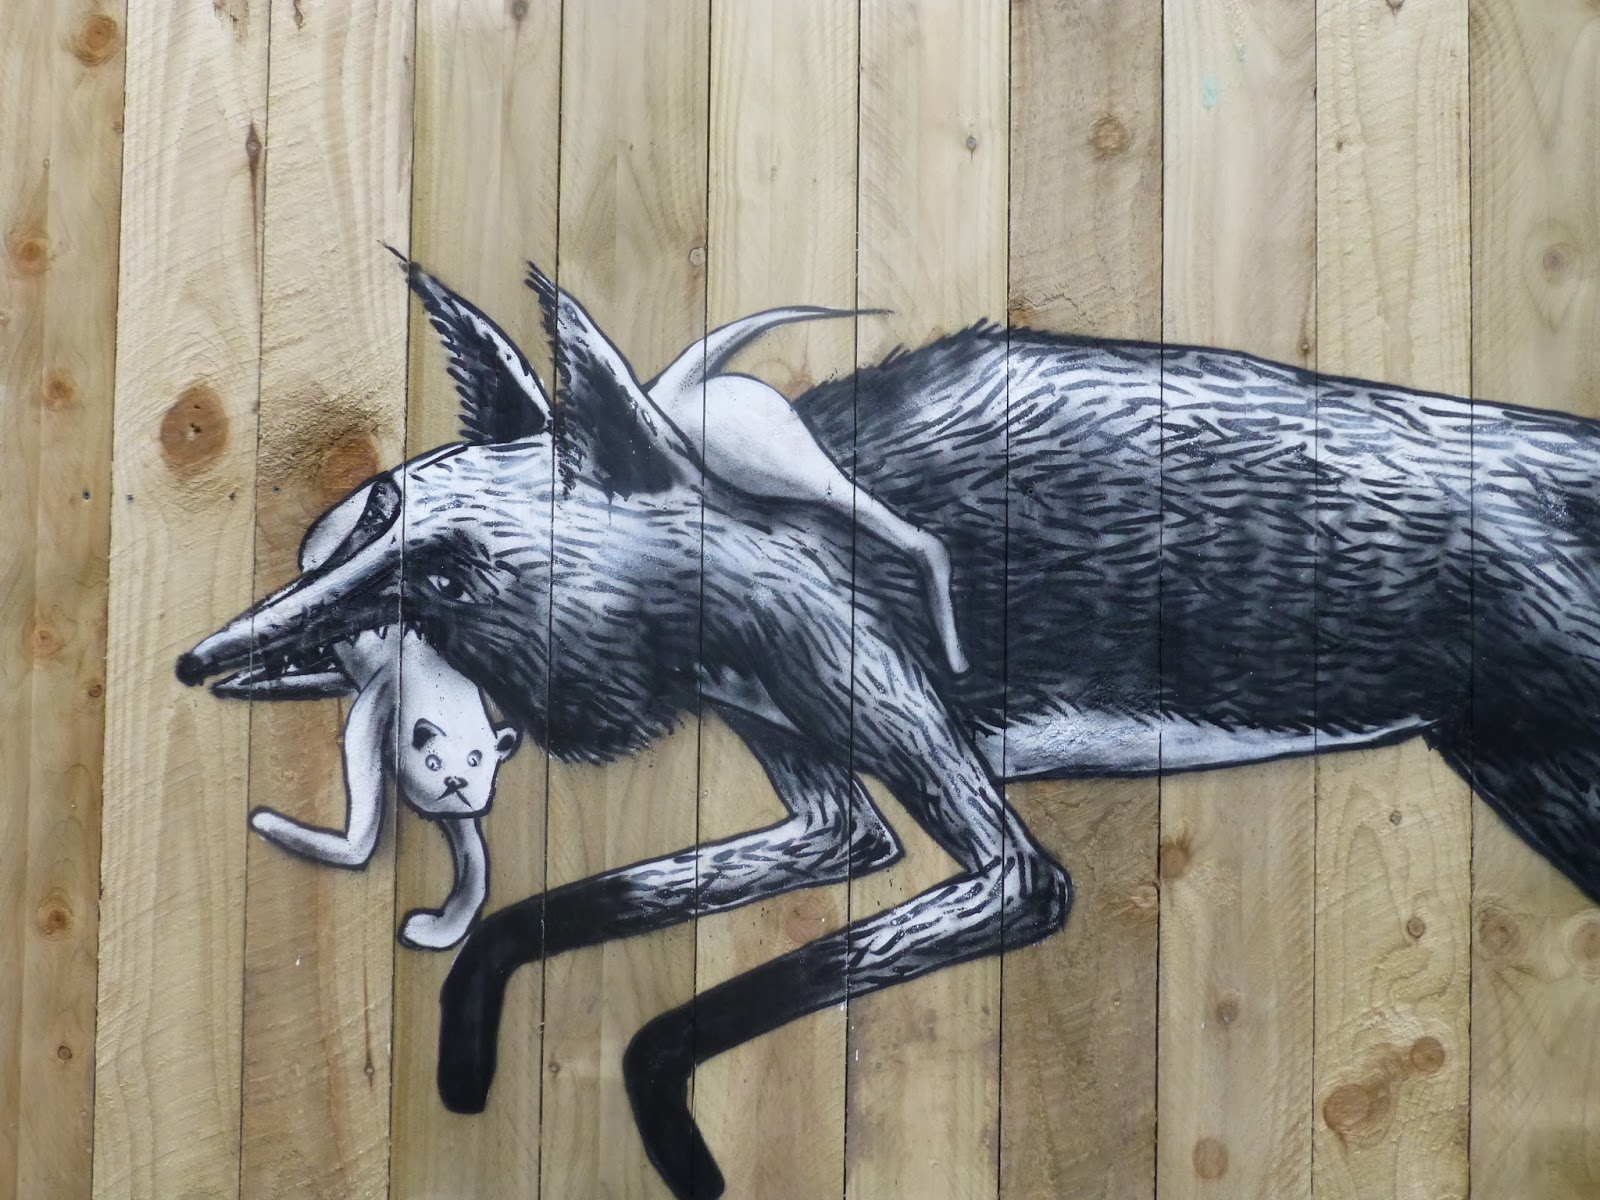 phlegm-urban-foxes-new-mural-sheffield-02